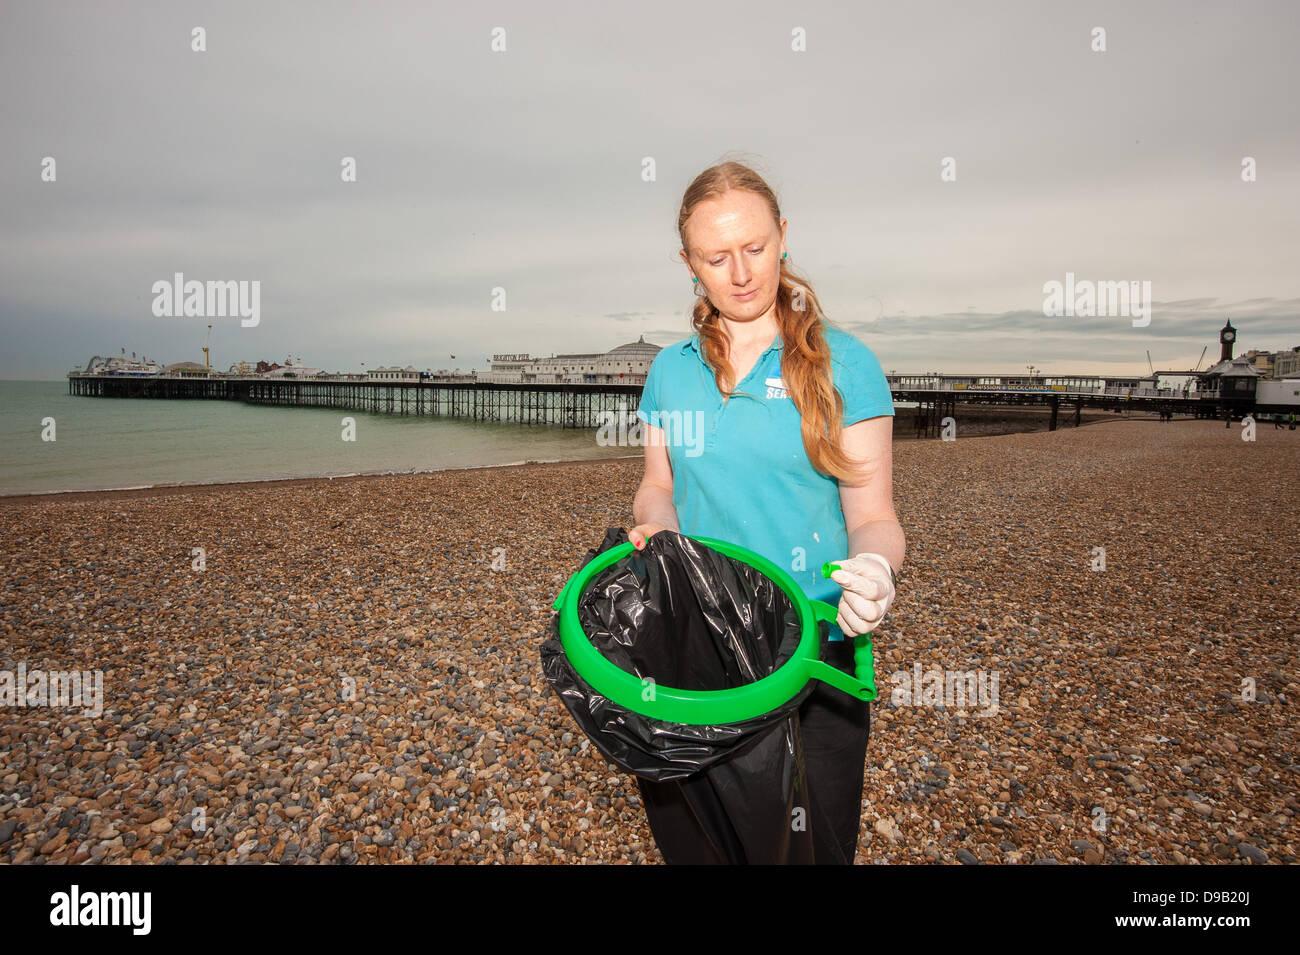 Brighton, UK. 17th June, 2013. Carey Duckworth, curator at  Brighton SeaLife Centre, examines litter dangerous to - Stock Image